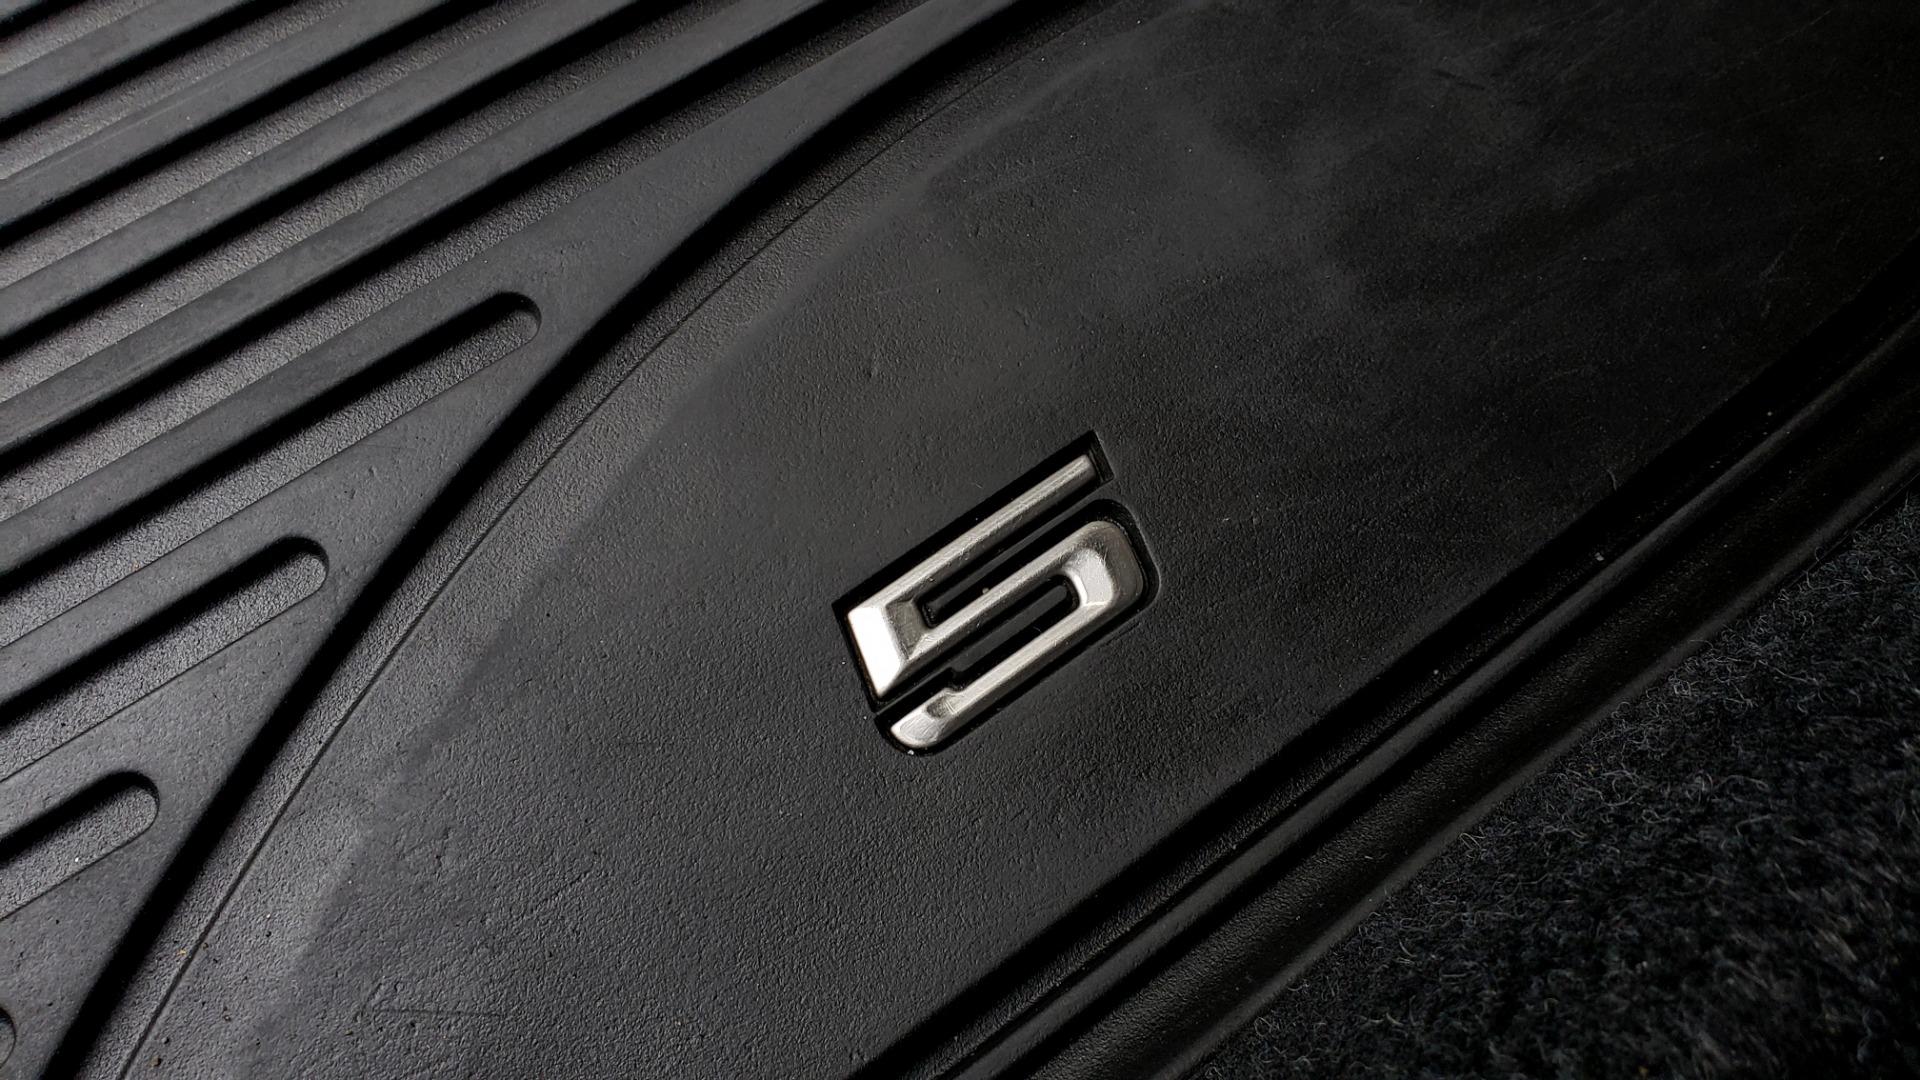 Used 2017 BMW 5 SERIES 530IXDRIVE / PREM PKG / DRVR ASST PLUS / CLD WTHR / APPLE CARPLAY for sale $30,595 at Formula Imports in Charlotte NC 28227 17